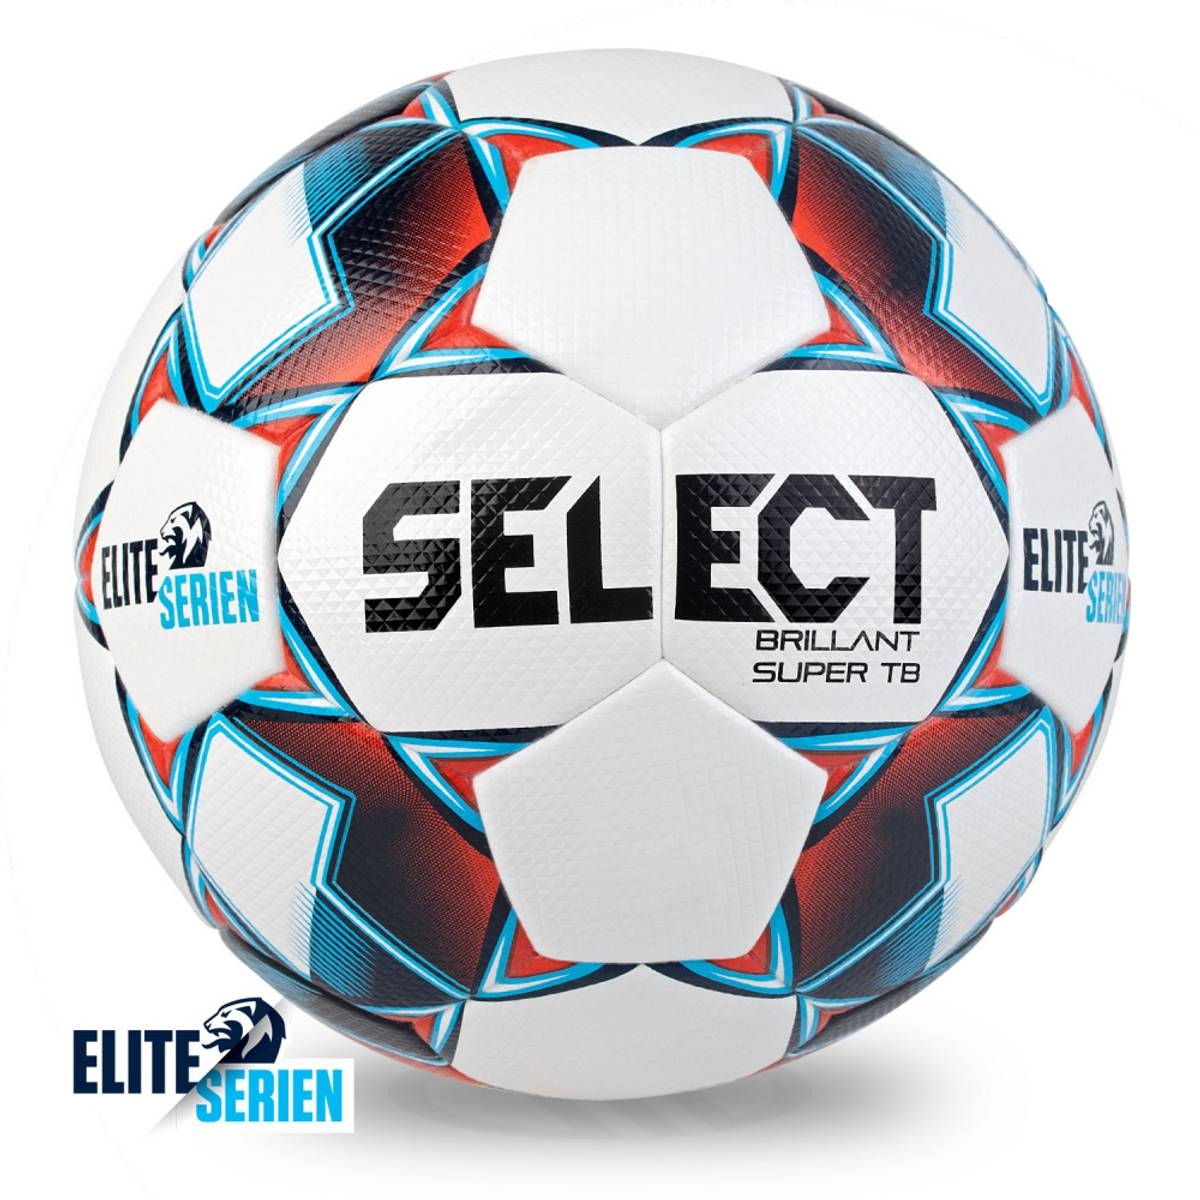 Select Eliteserien Brillant Super TB fotball